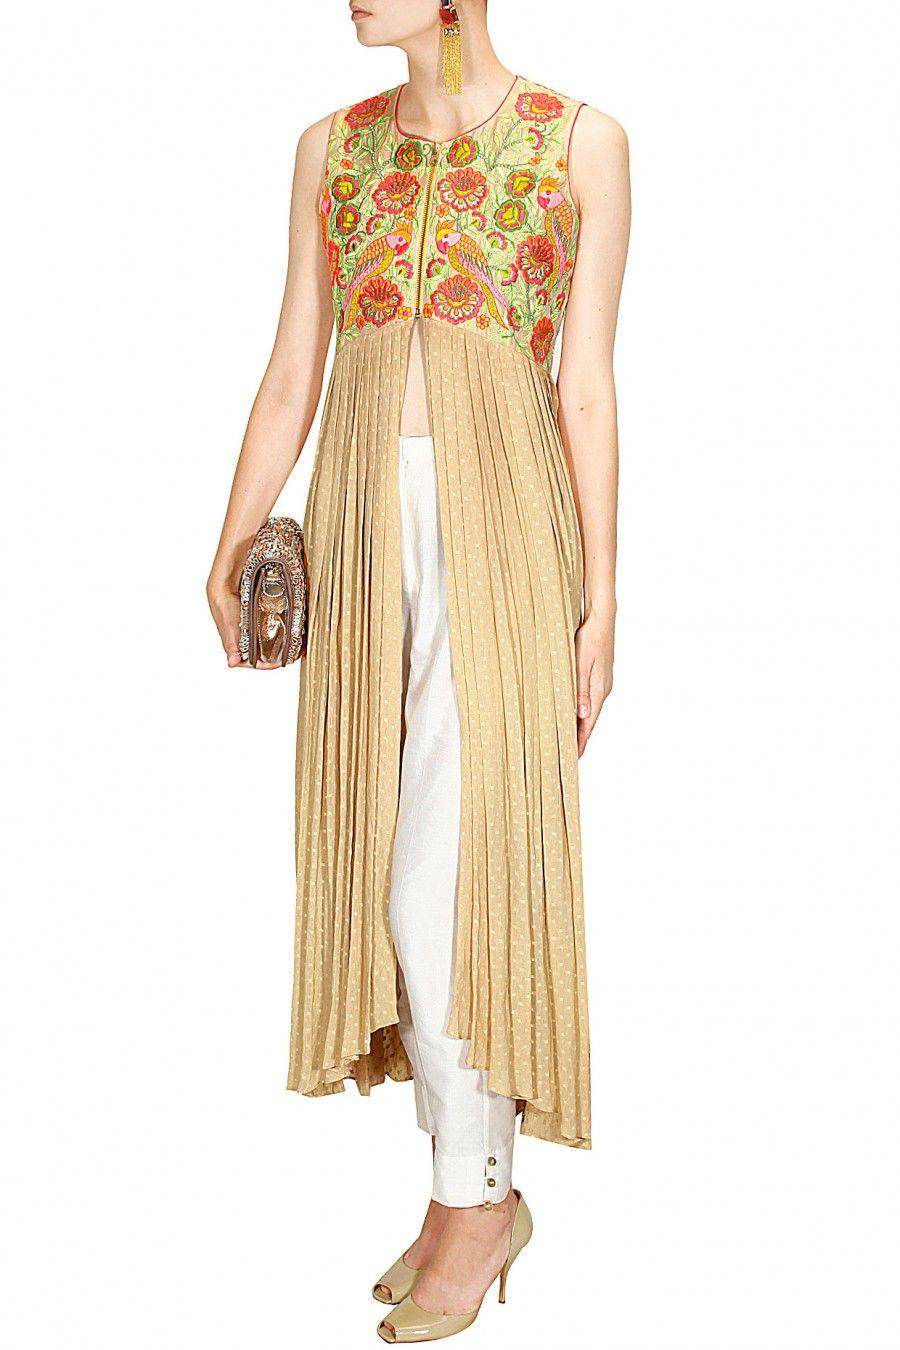 #beige #zippercapes #shopbirdy #labelsurabhiarya #fitforfestivity #styleit #flauntit